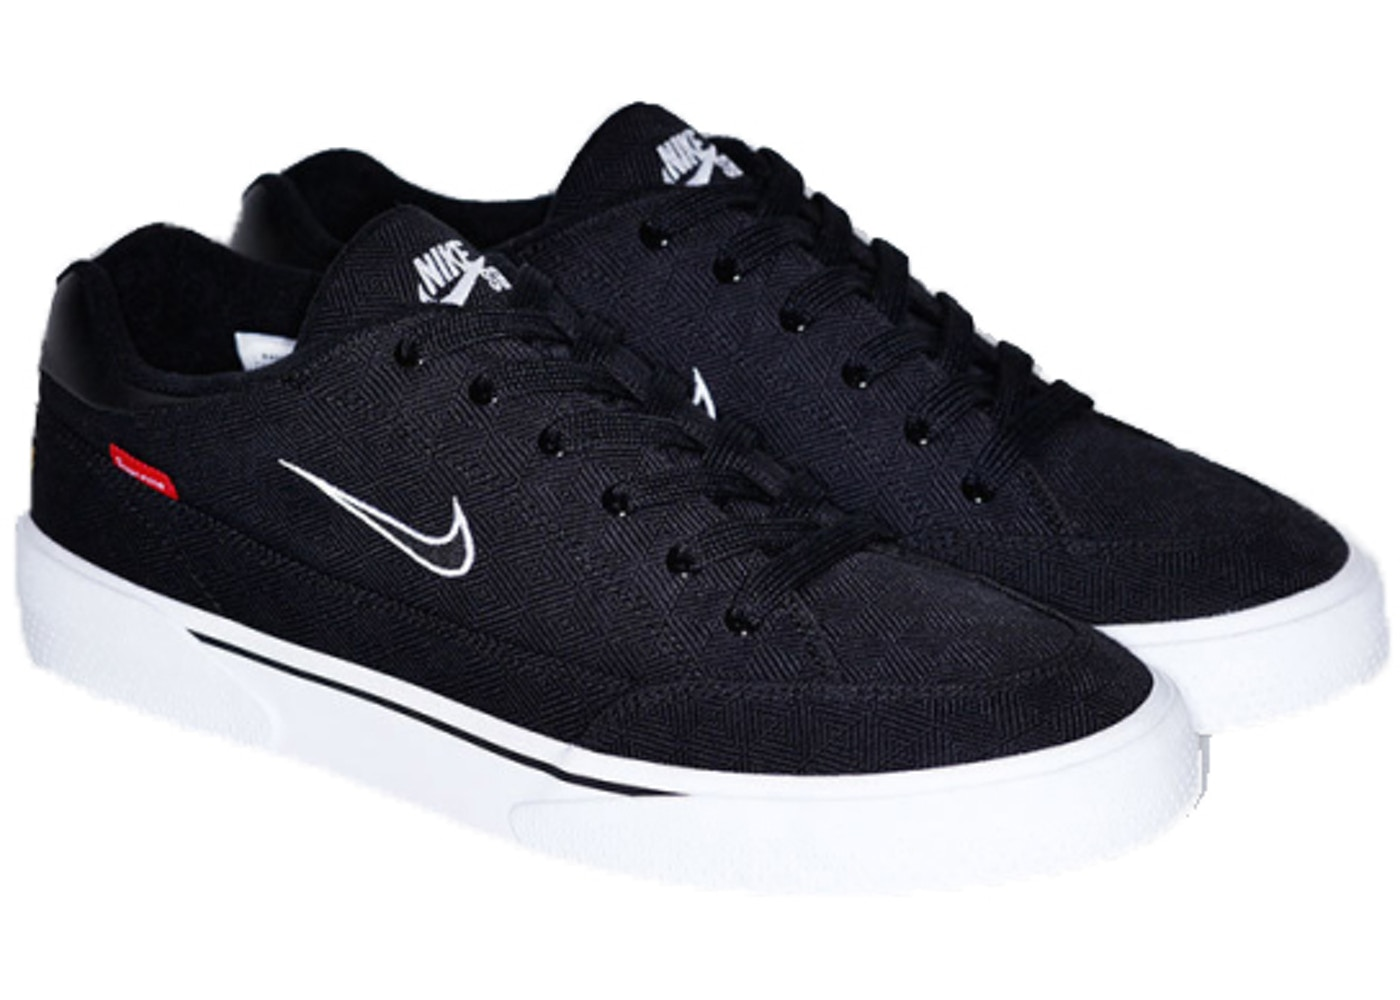 promo code 9e1ed 246b0 Nike SB Other Shoes - Highest Bid